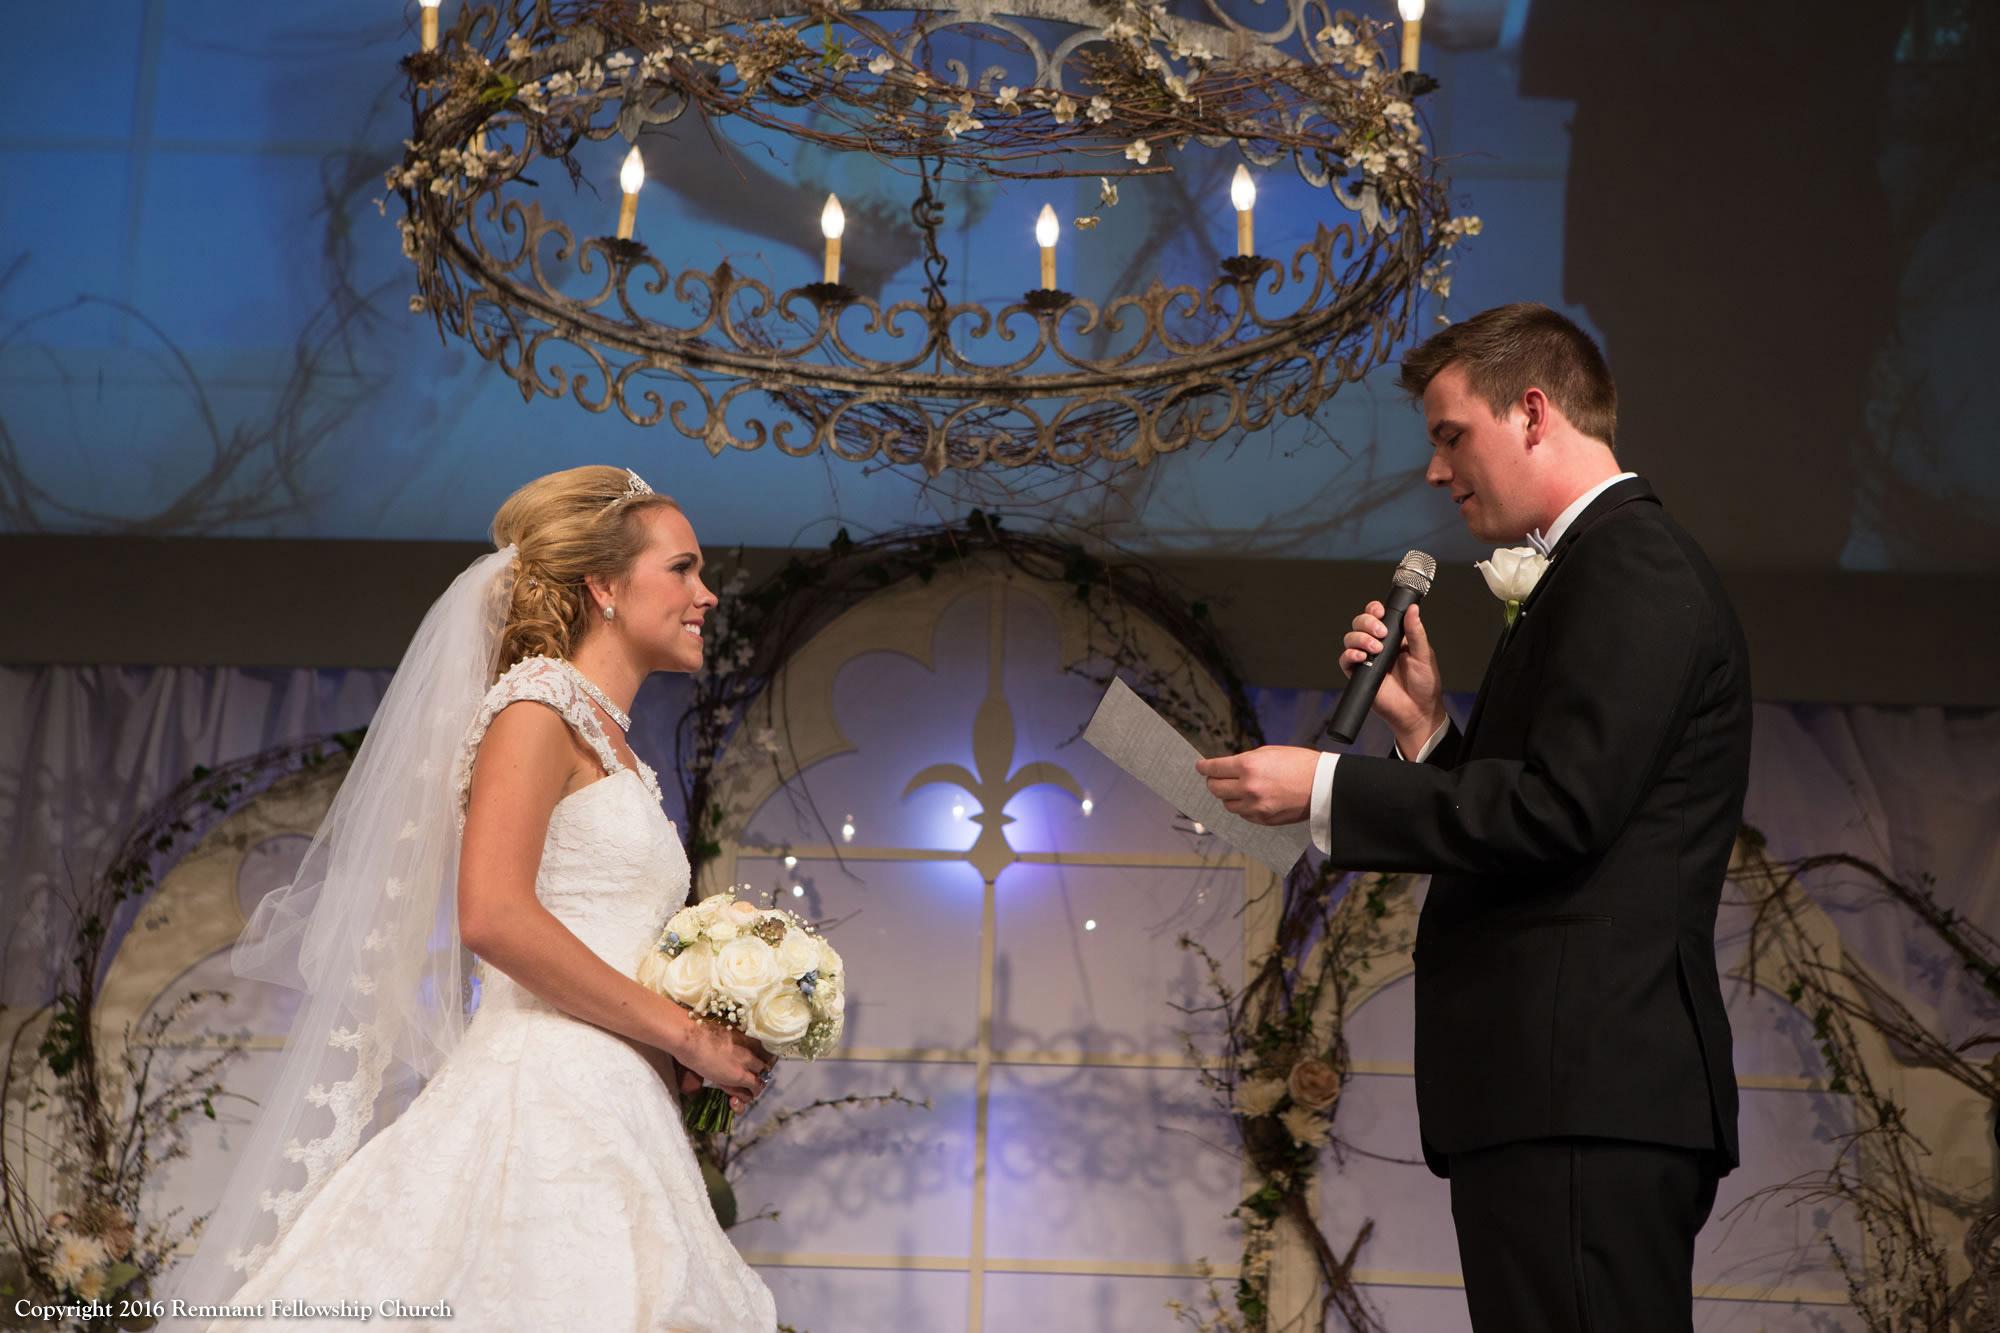 Remnant-Fellowship-Wedding-Langsdon-Travis-groom-vows